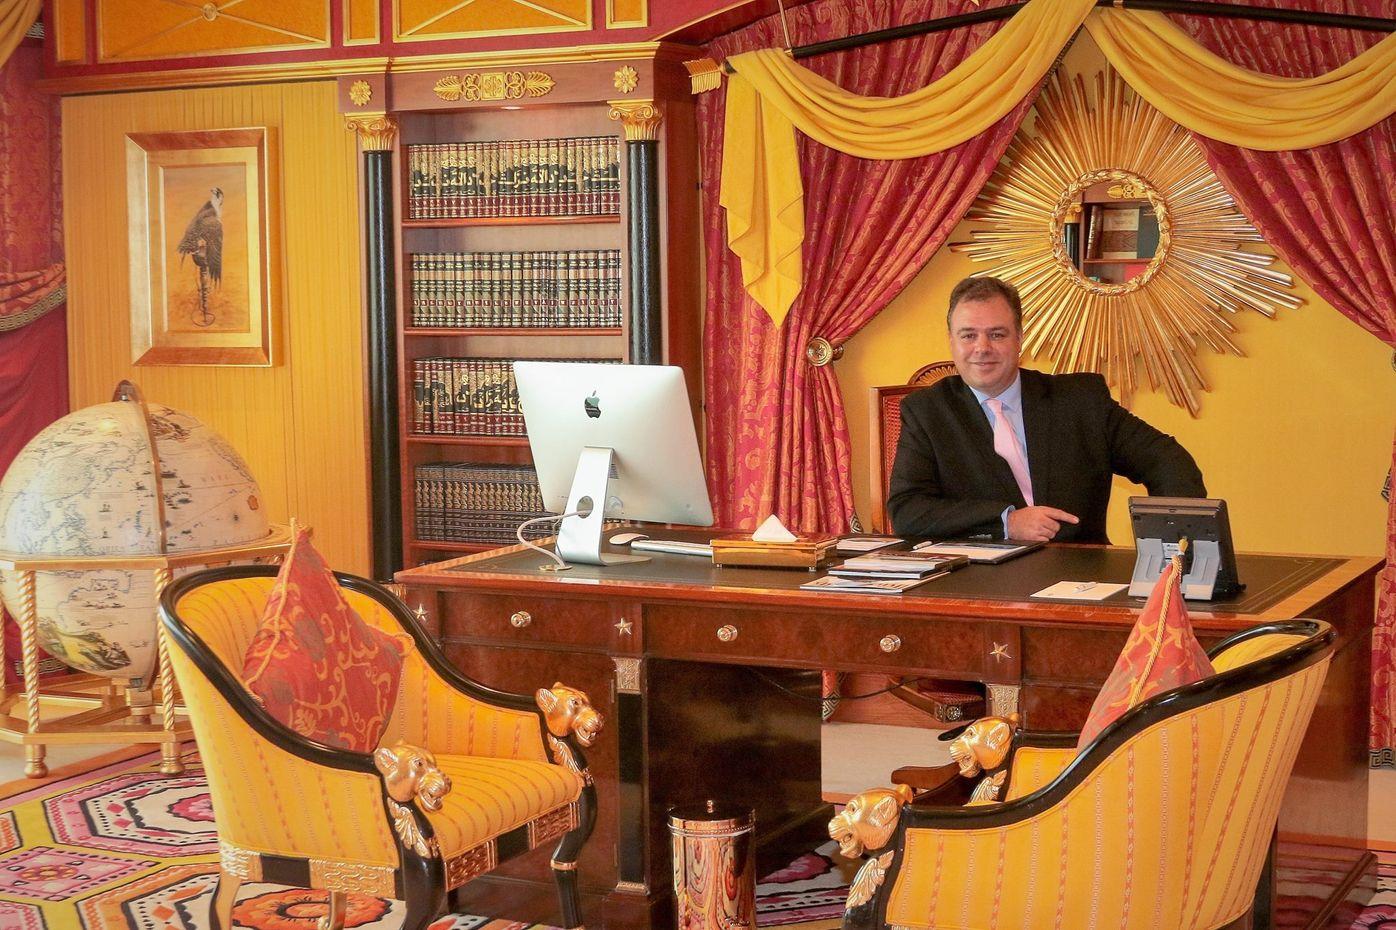 Ernesto verdugo in his Office